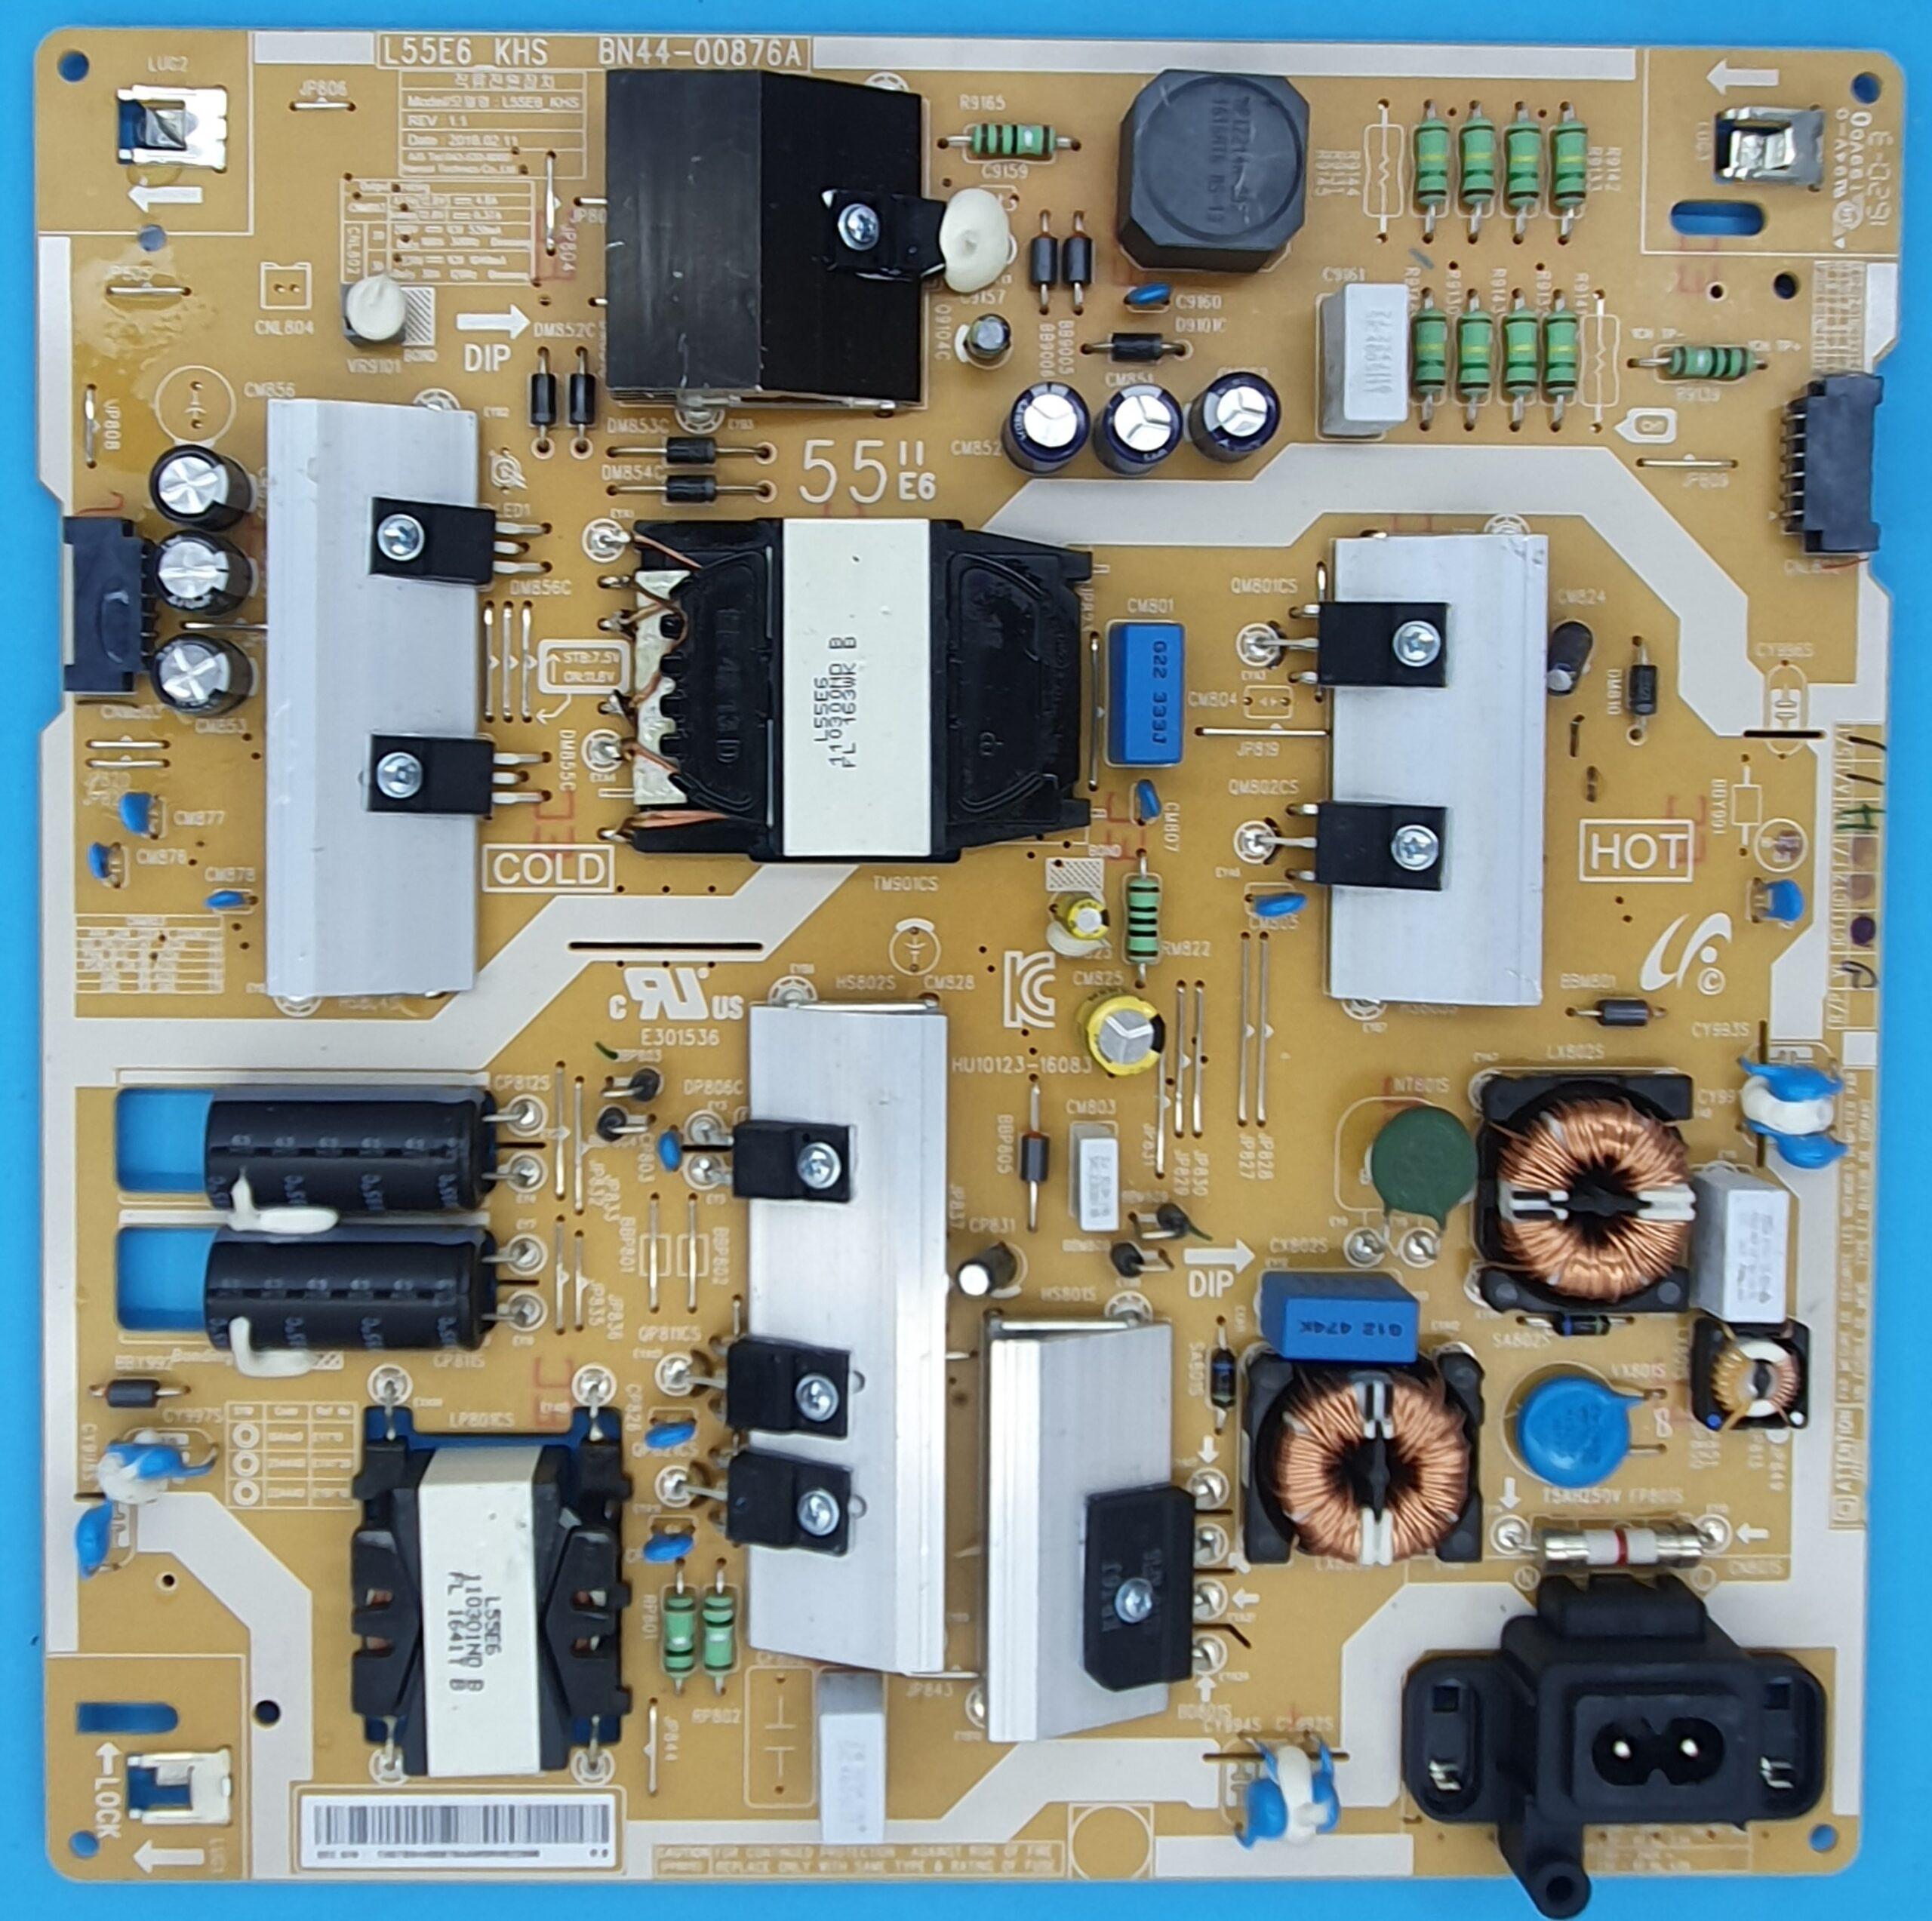 BN44-00876A Samsung Power (KDV DAHİL = 400 TL)